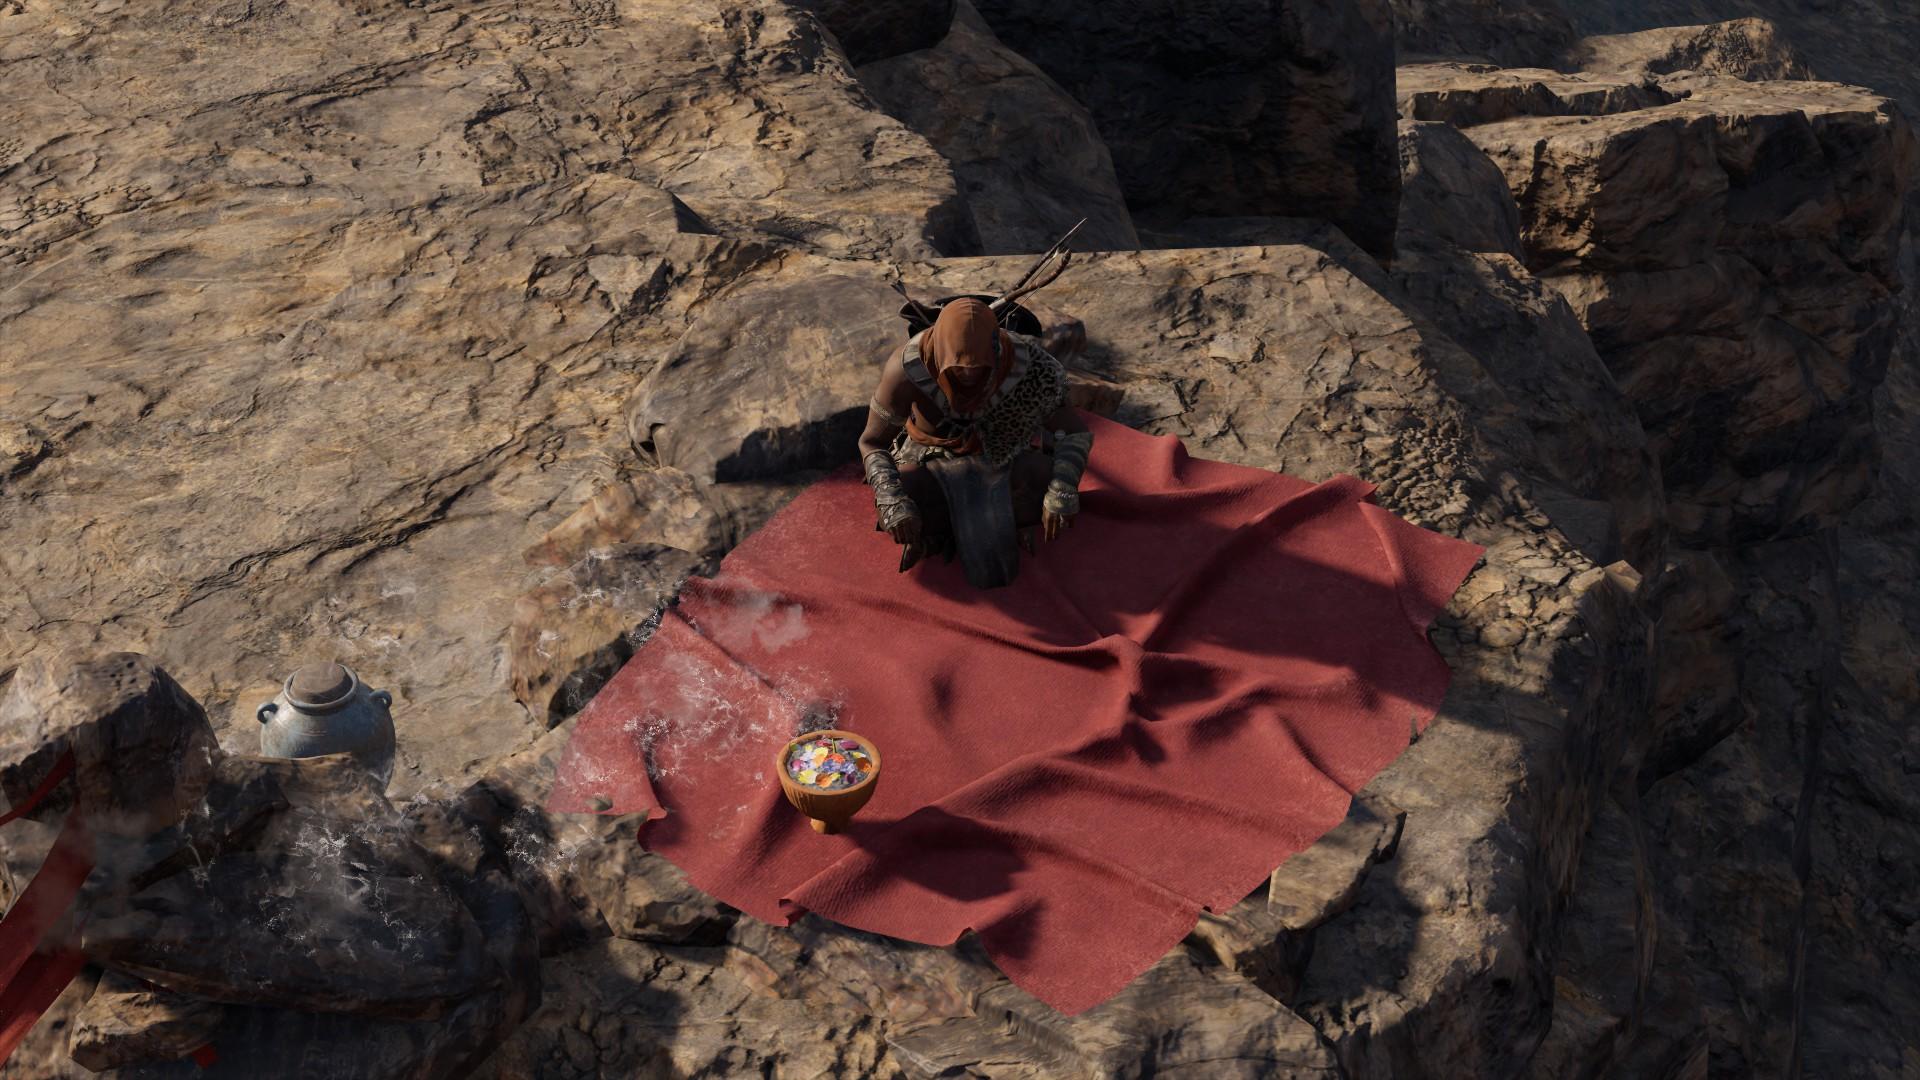 На вершине горы - Assassin's Creed: Origins